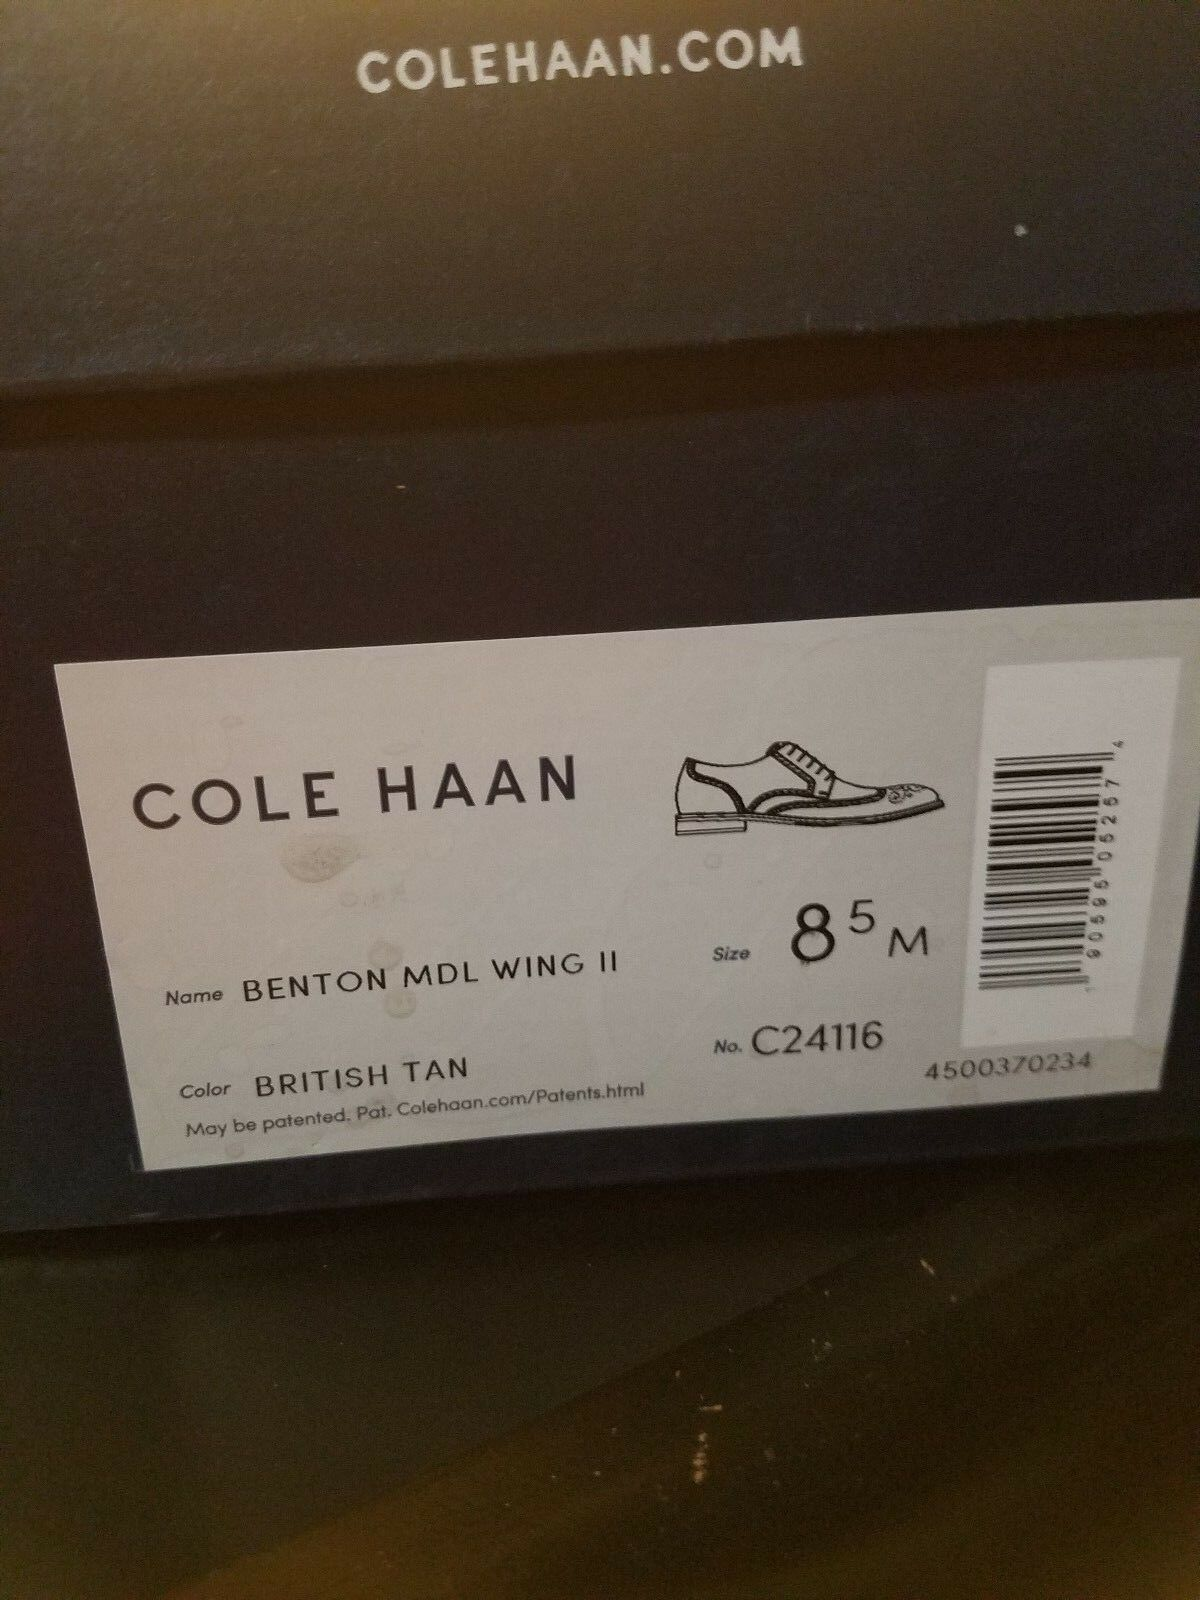 COLE HAAN BENTON WINGTIP OXFORD II (C24116) BNIB RARE RARE RARE HIGH QUALITY SZ  8.5M c45611